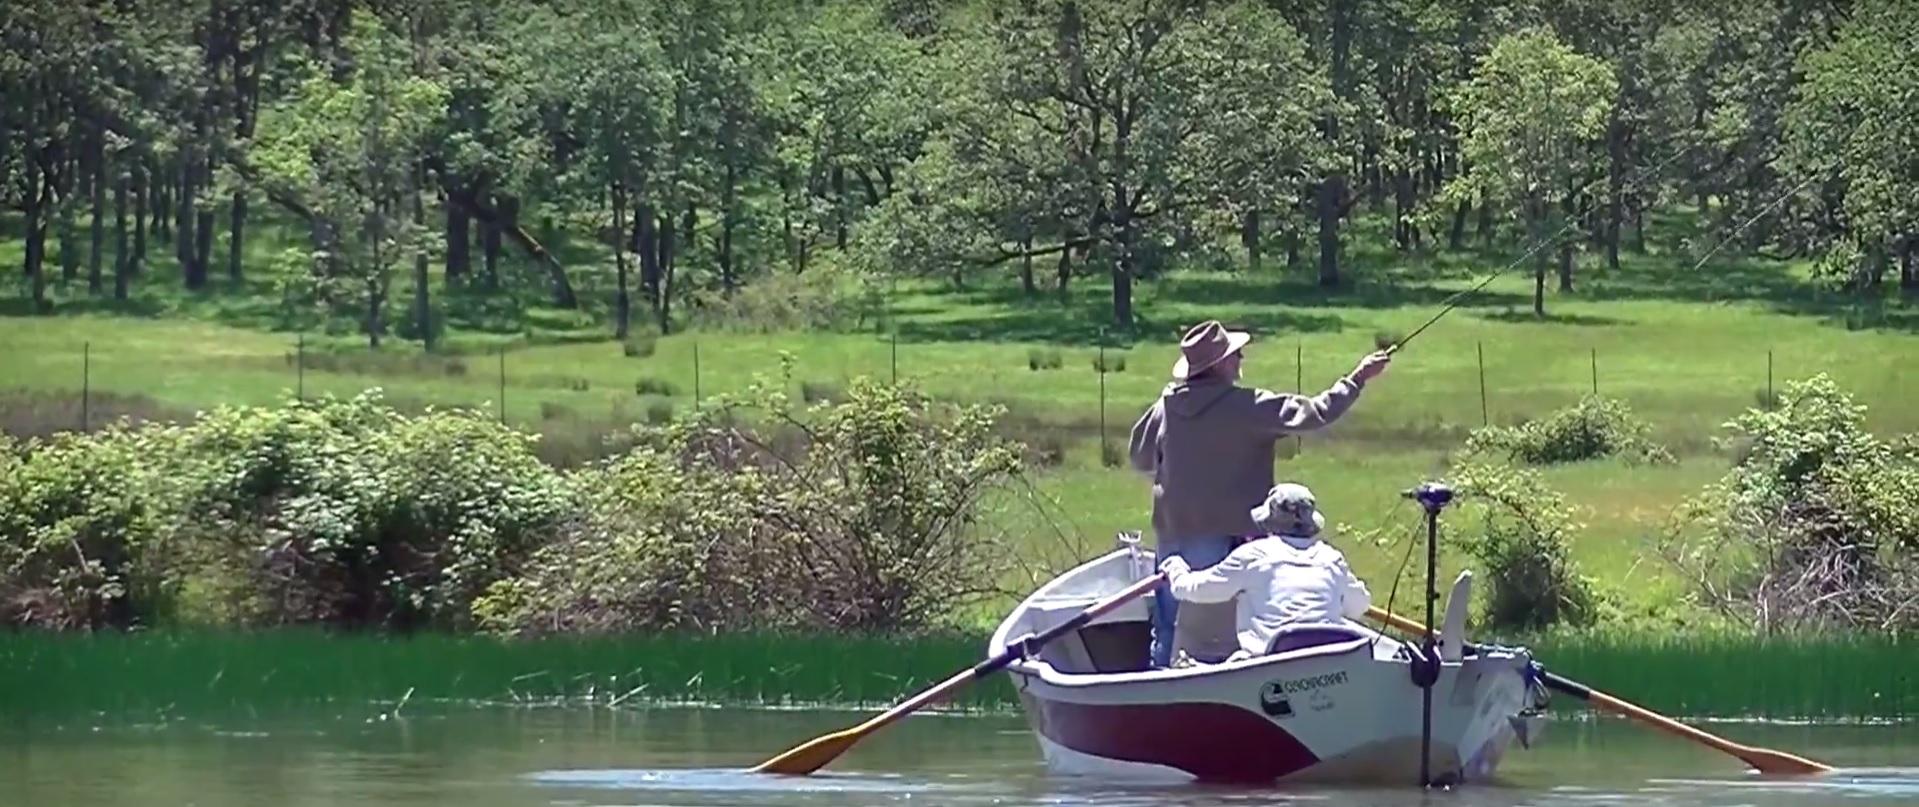 Bass Fishing with the PHWFF Umpqua, Oregon Program (VIDEO)